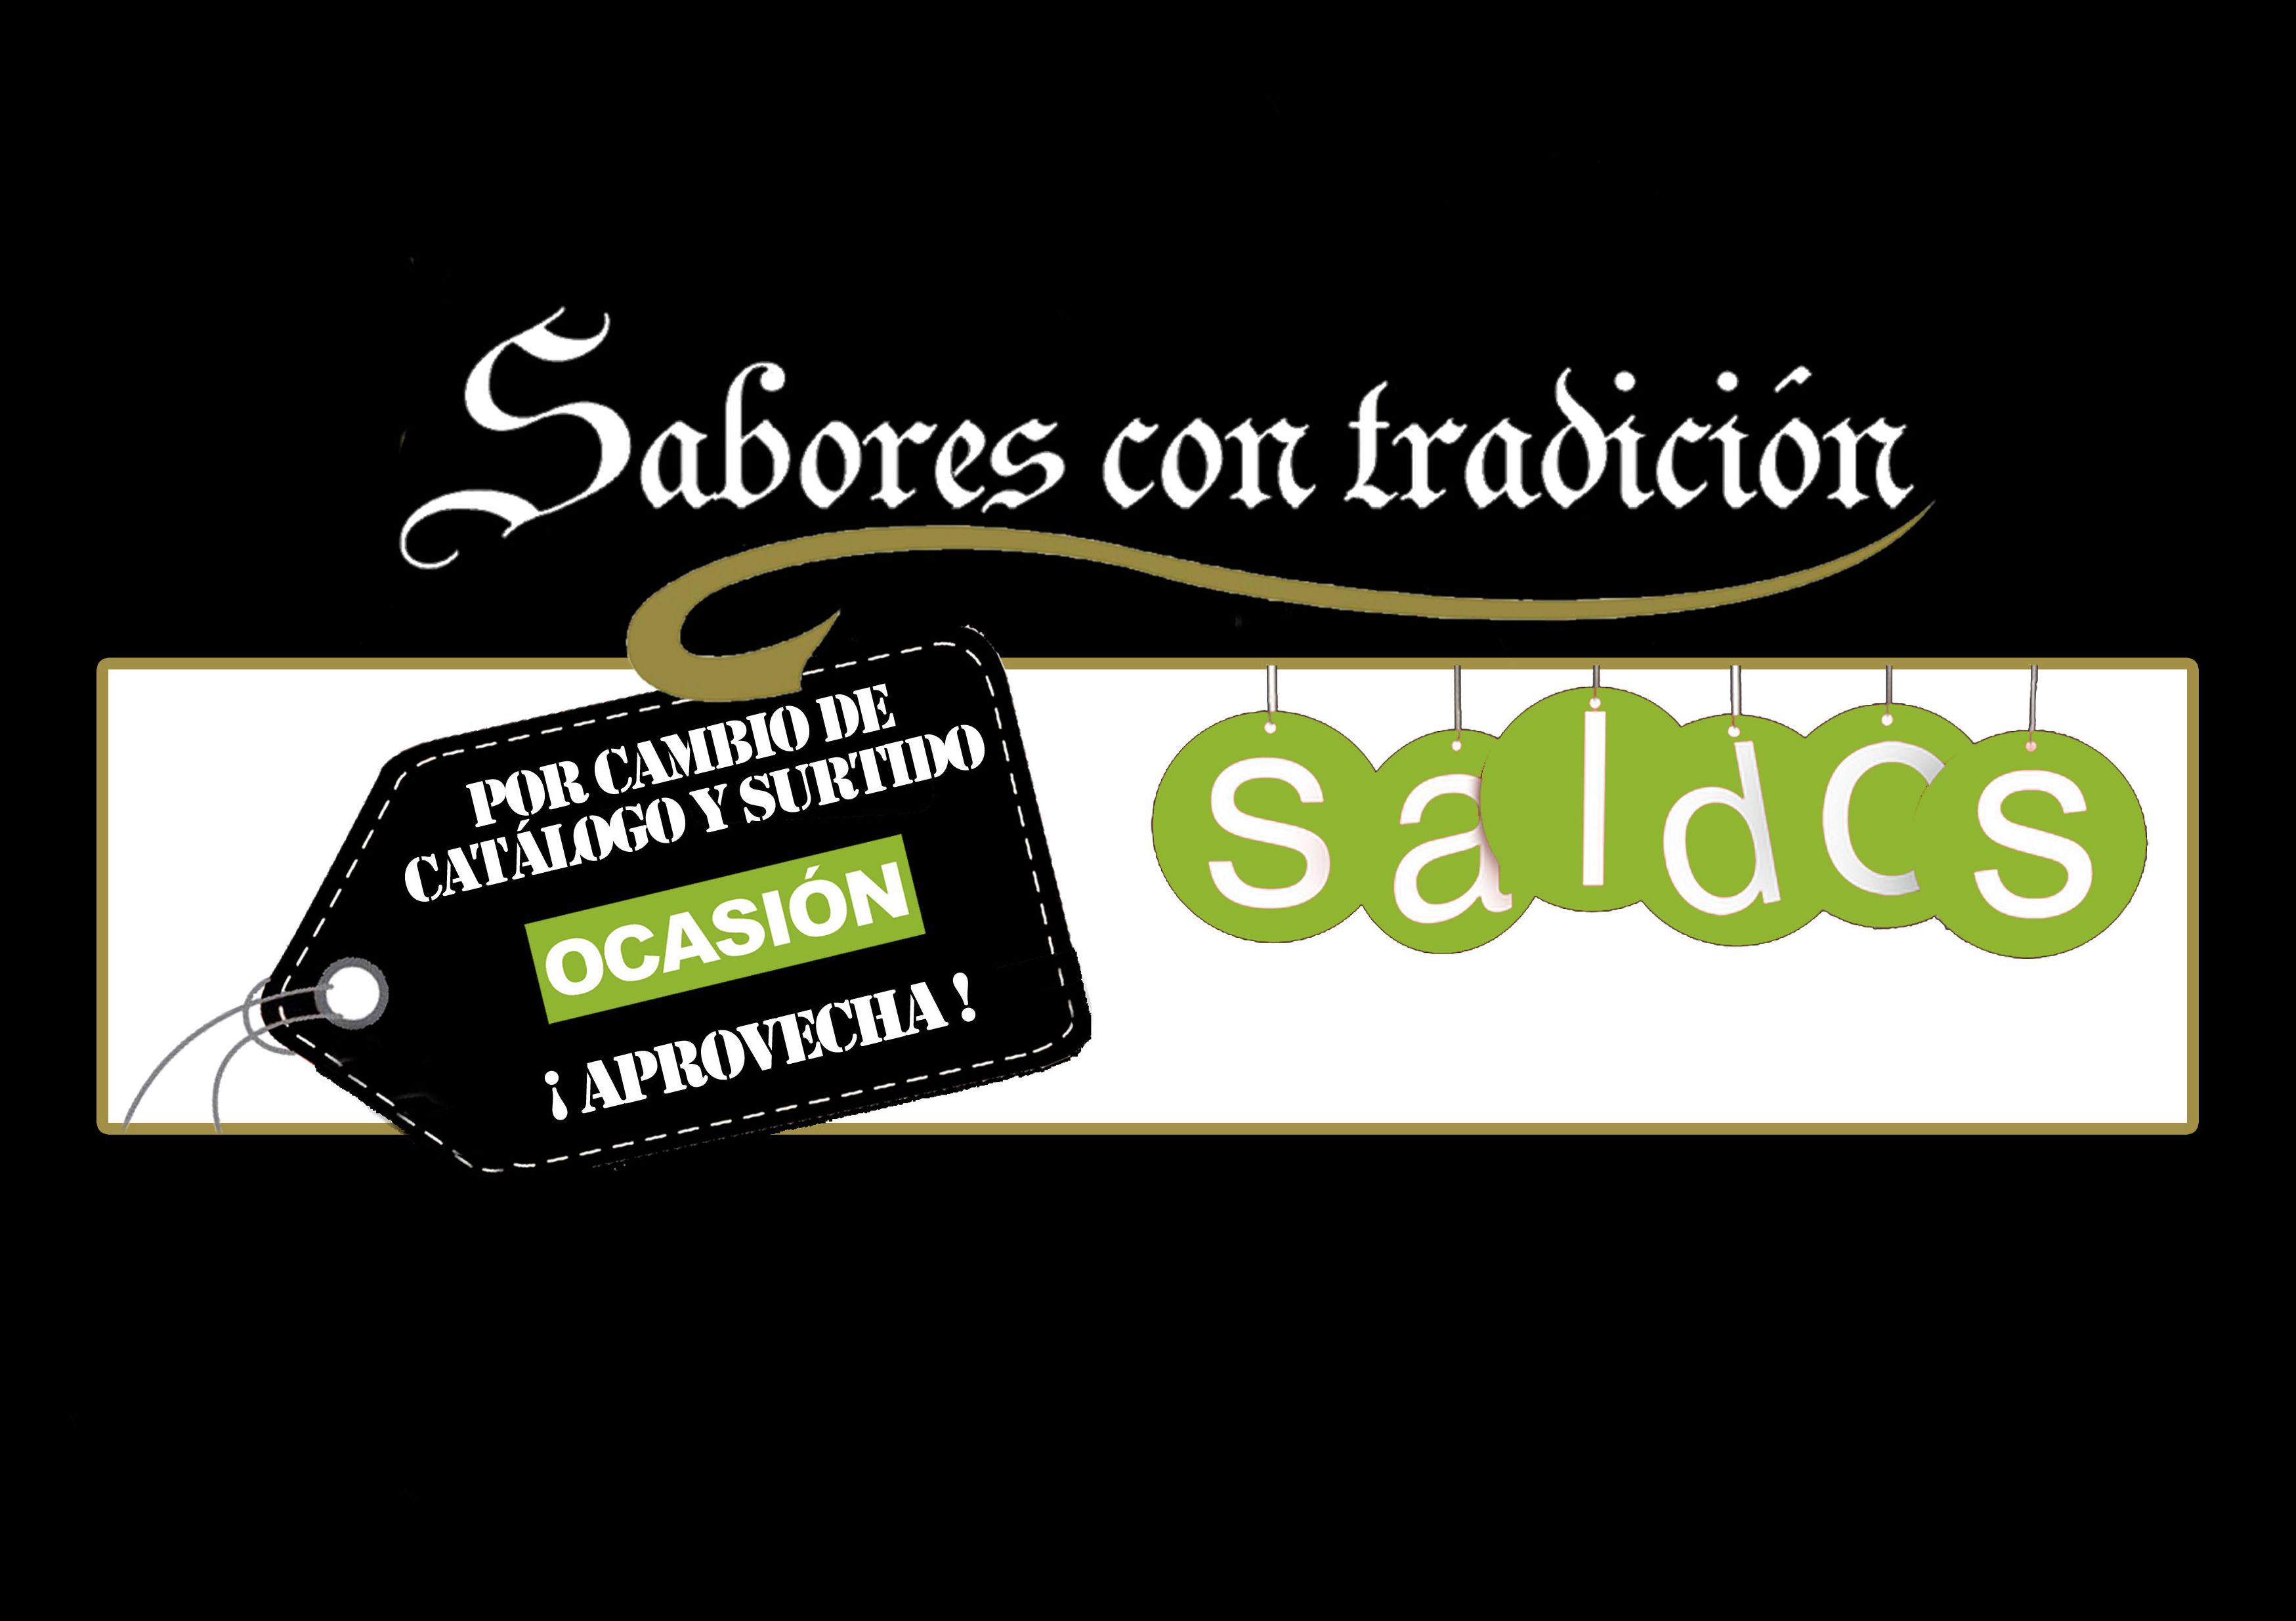 SALDOS ALIMENTACION